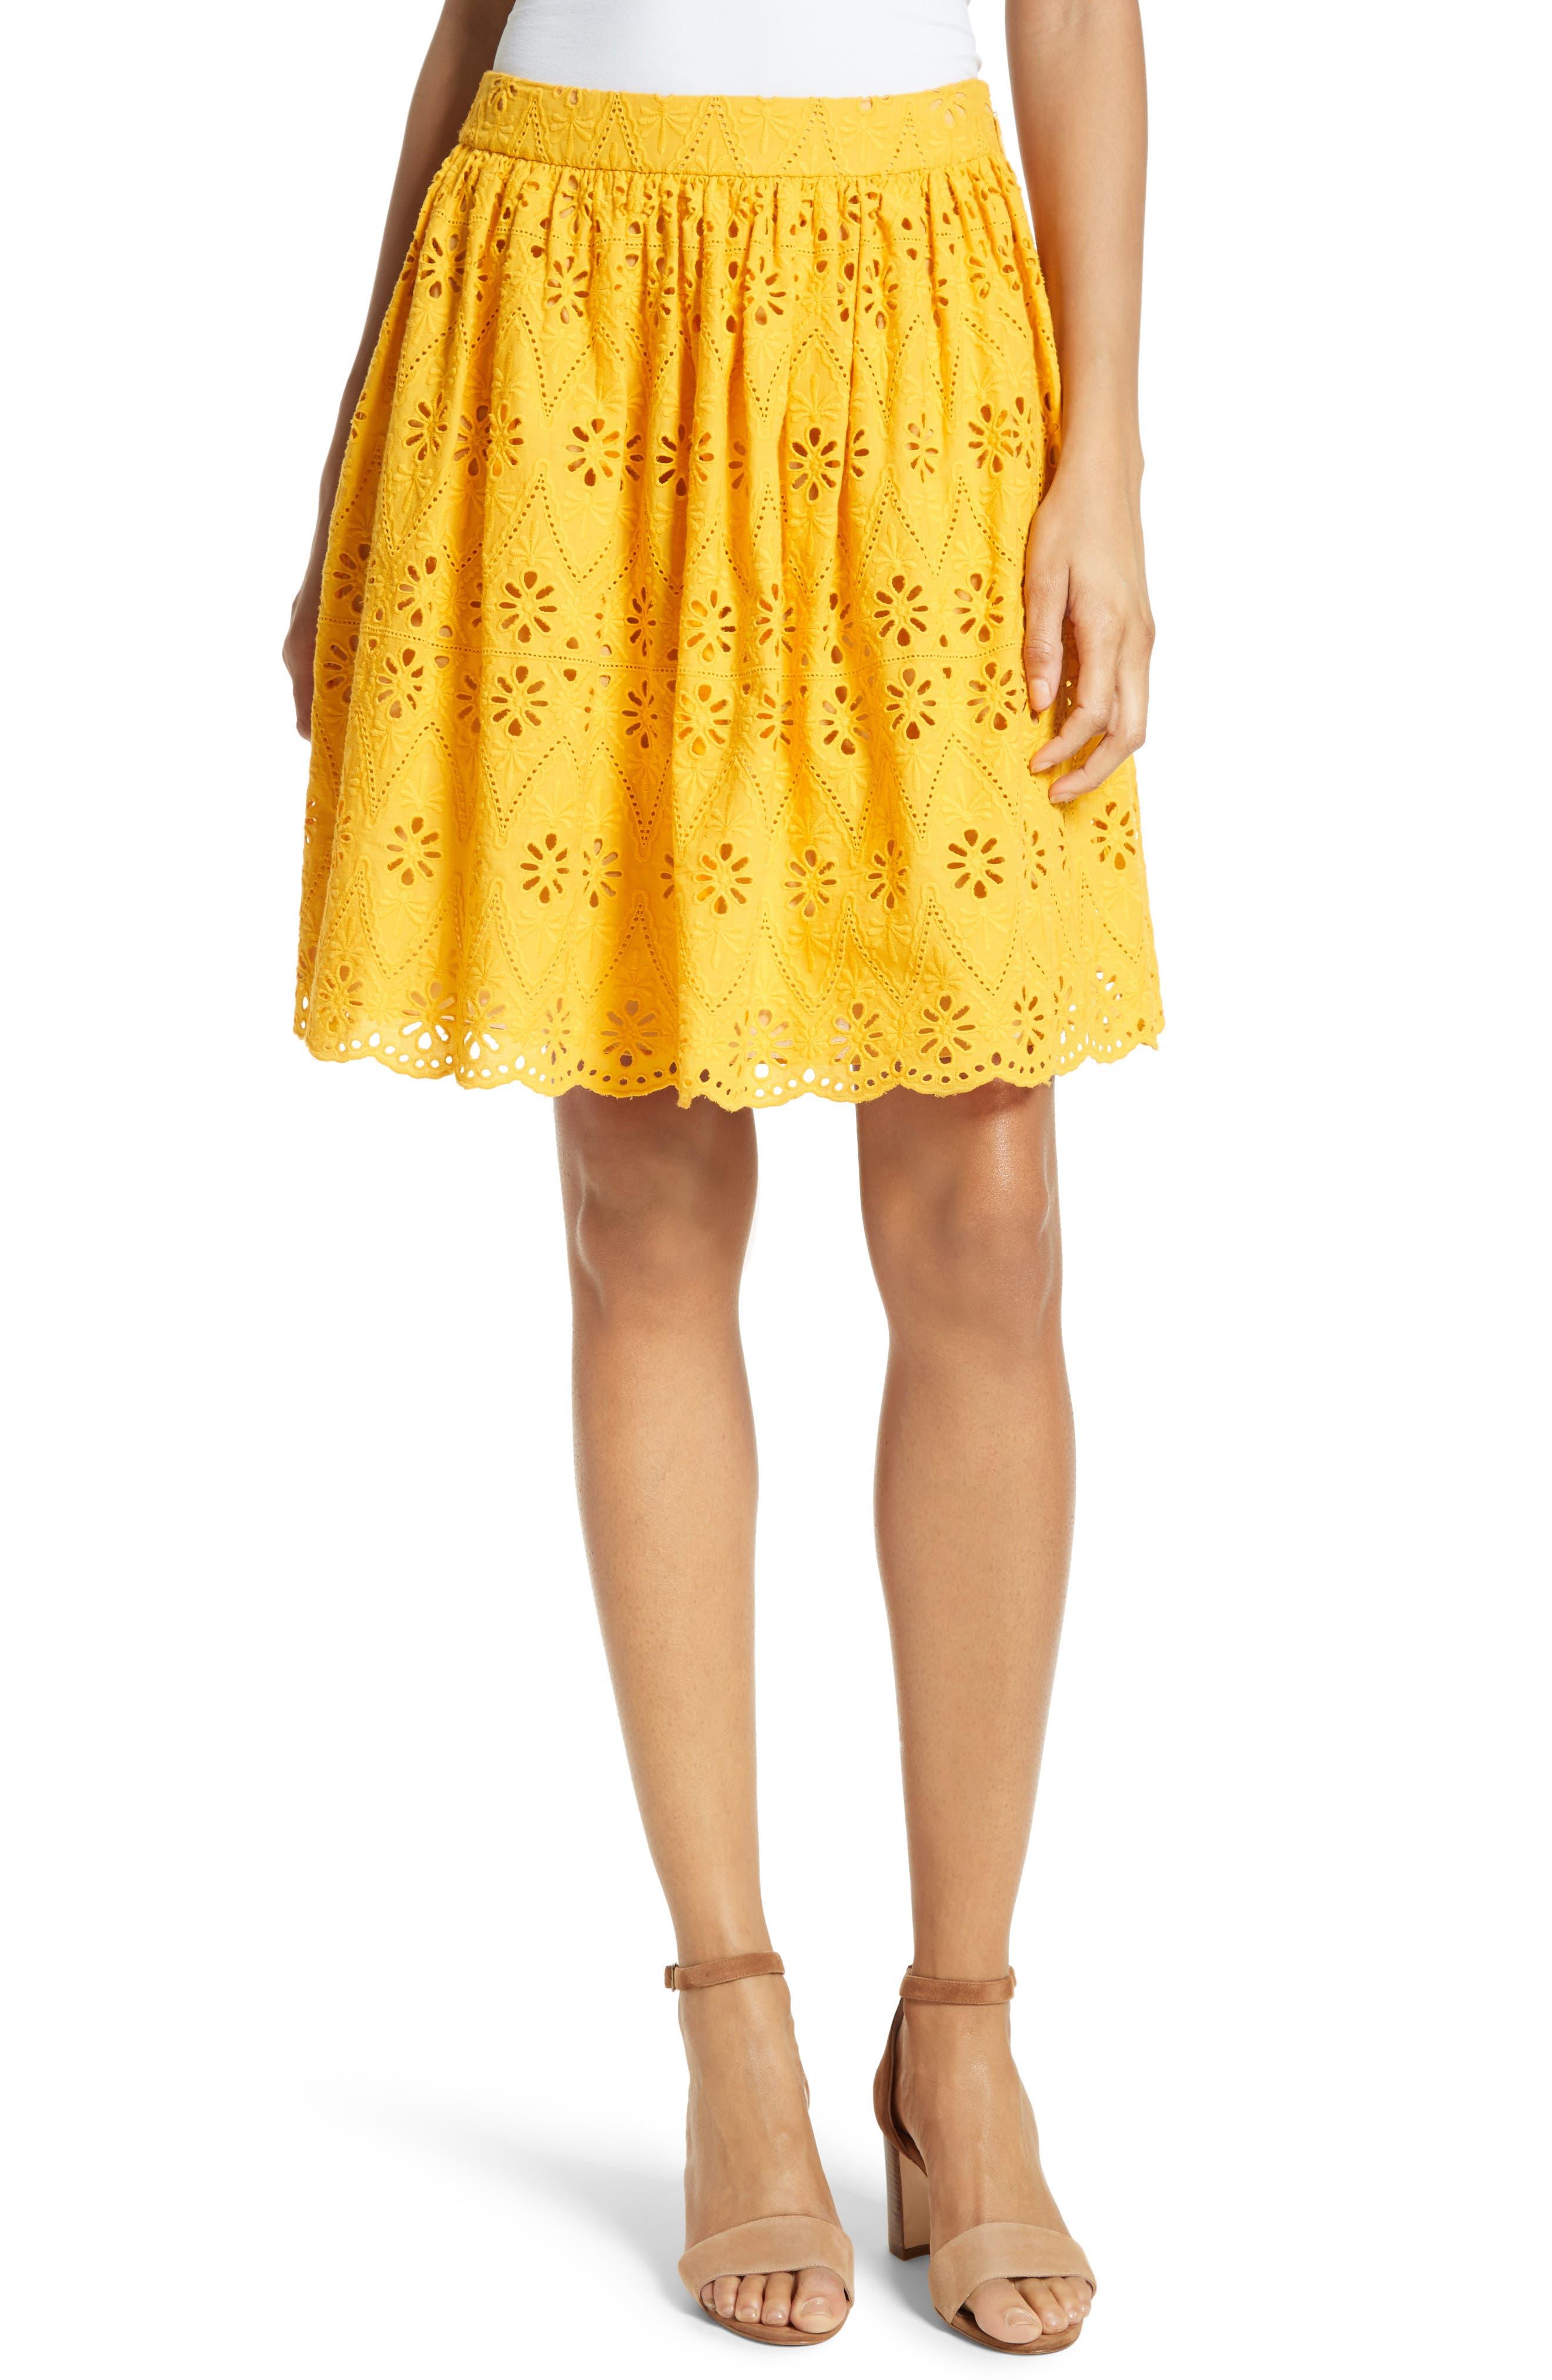 Alternate Image 1 Selected - kate spade new york eyelet embroidered skirt